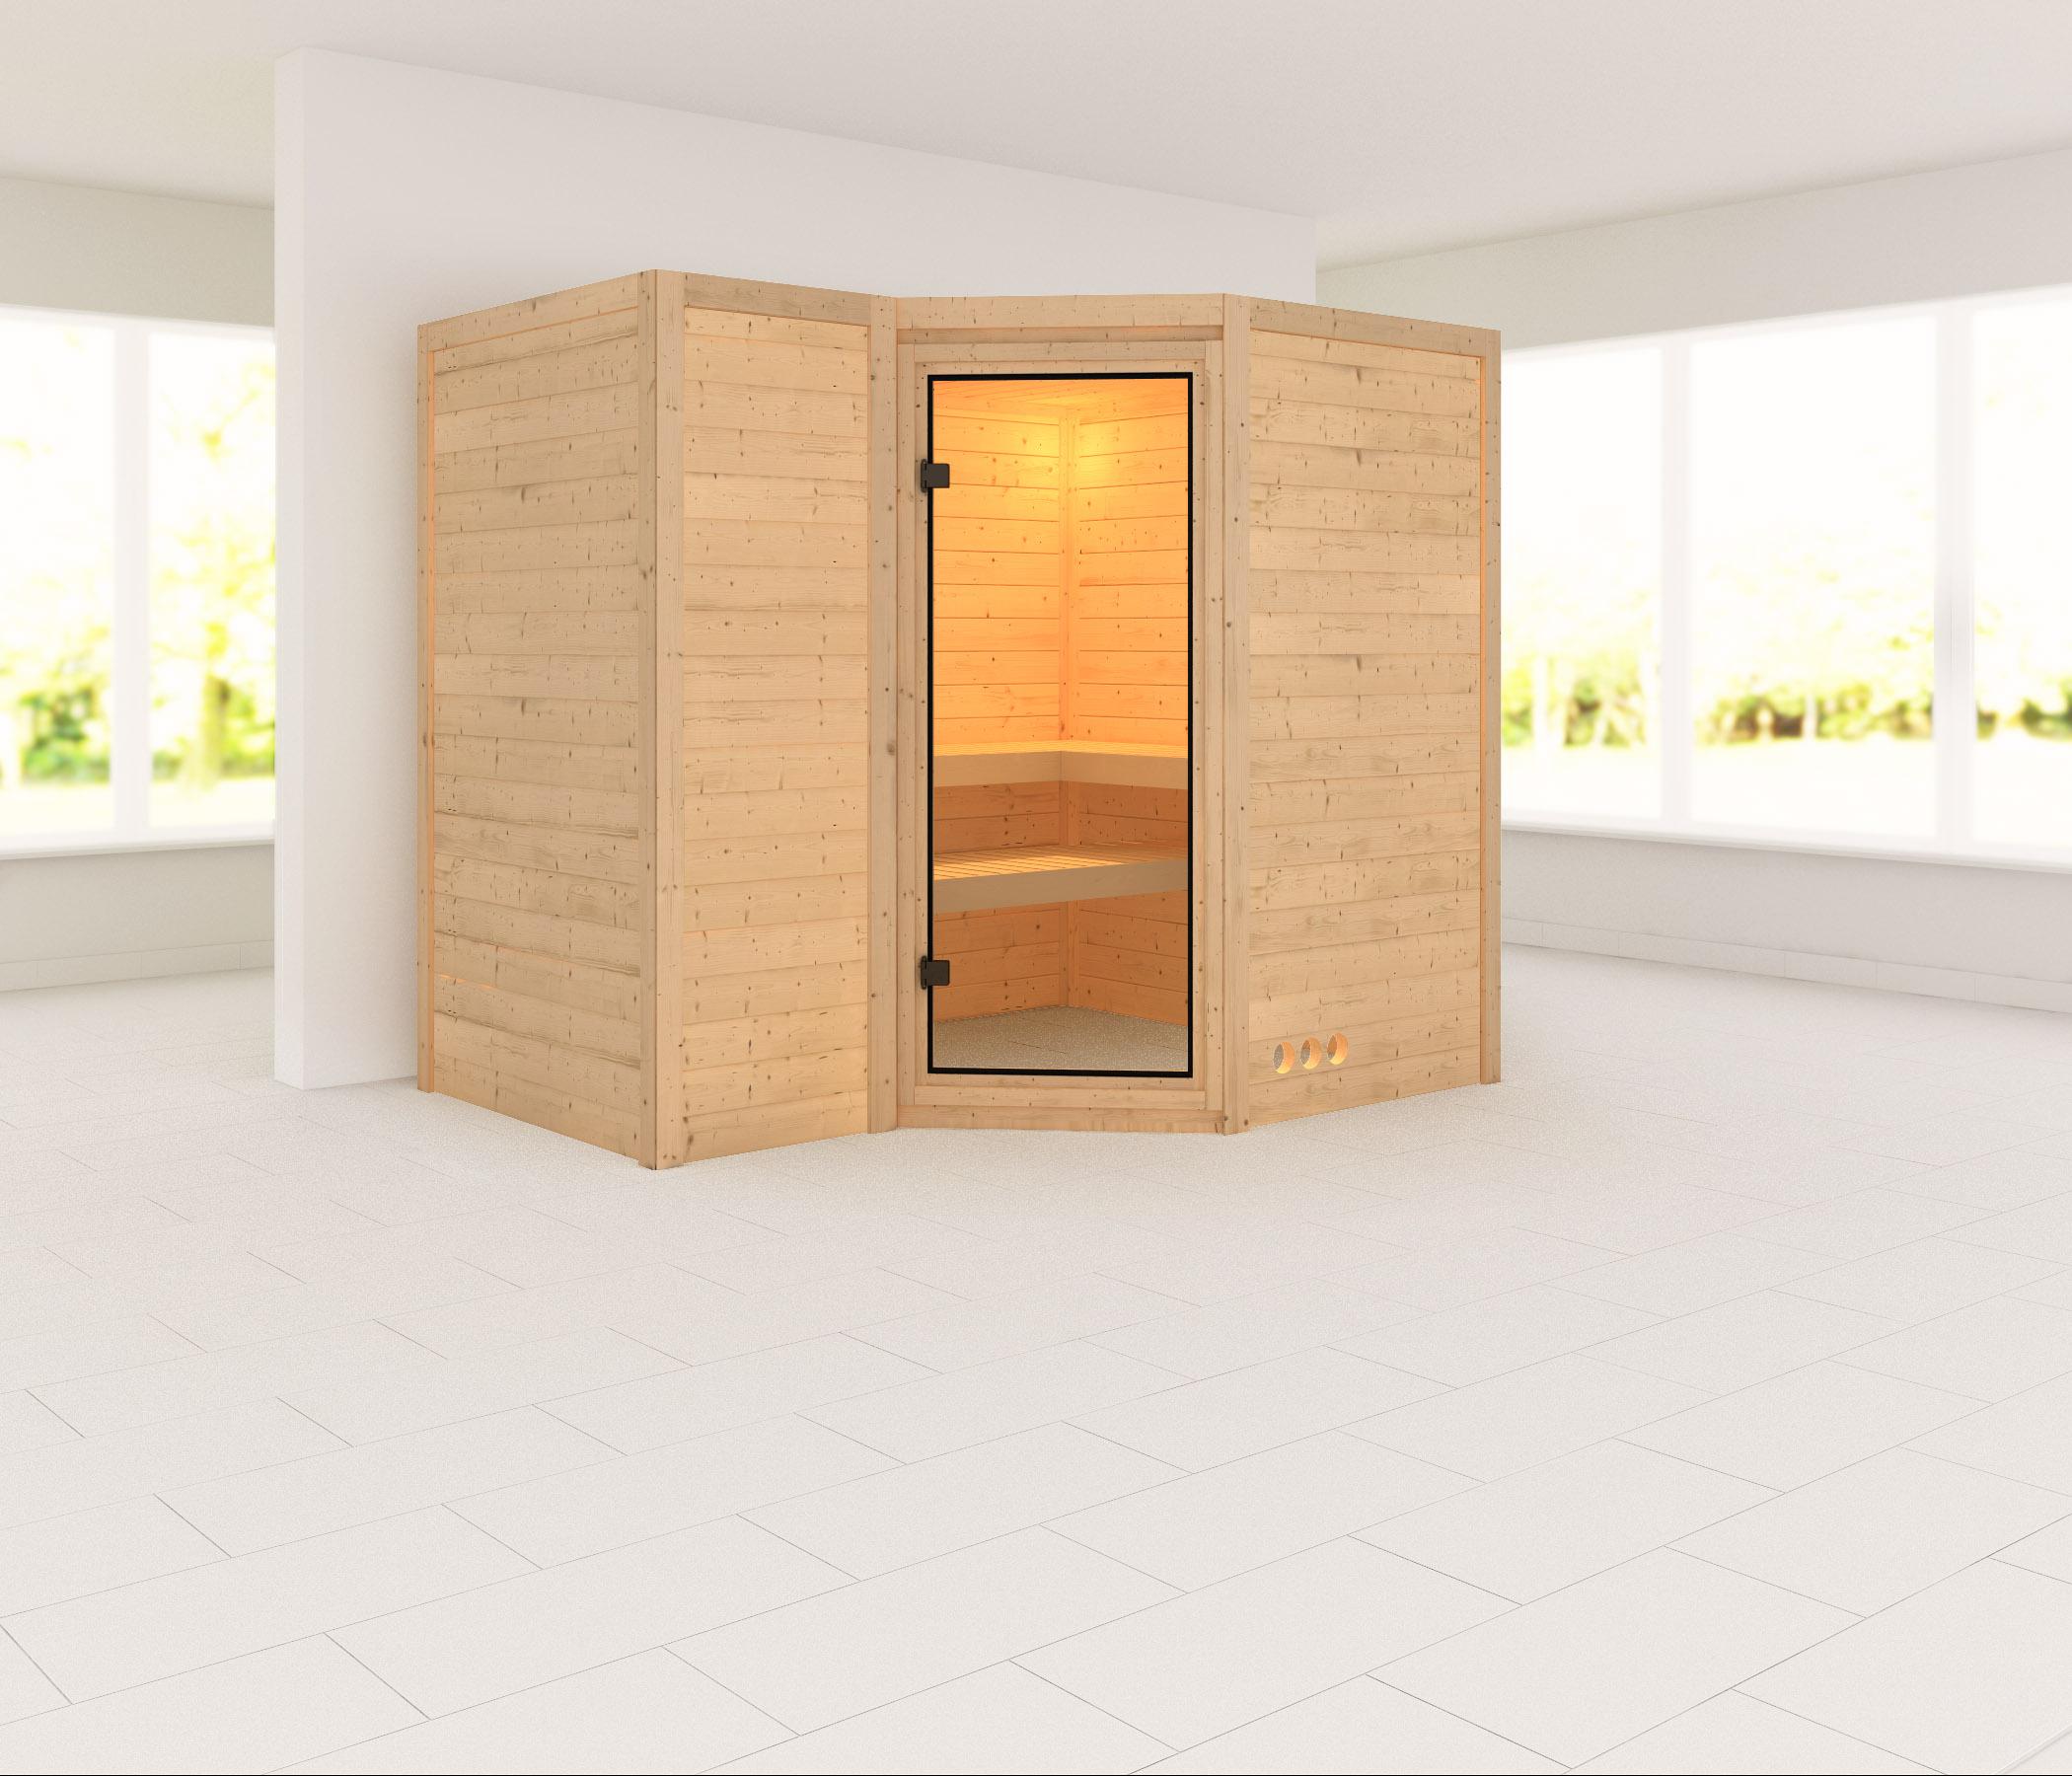 karibu sauna sahib 2 welche sauna kaufen. Black Bedroom Furniture Sets. Home Design Ideas